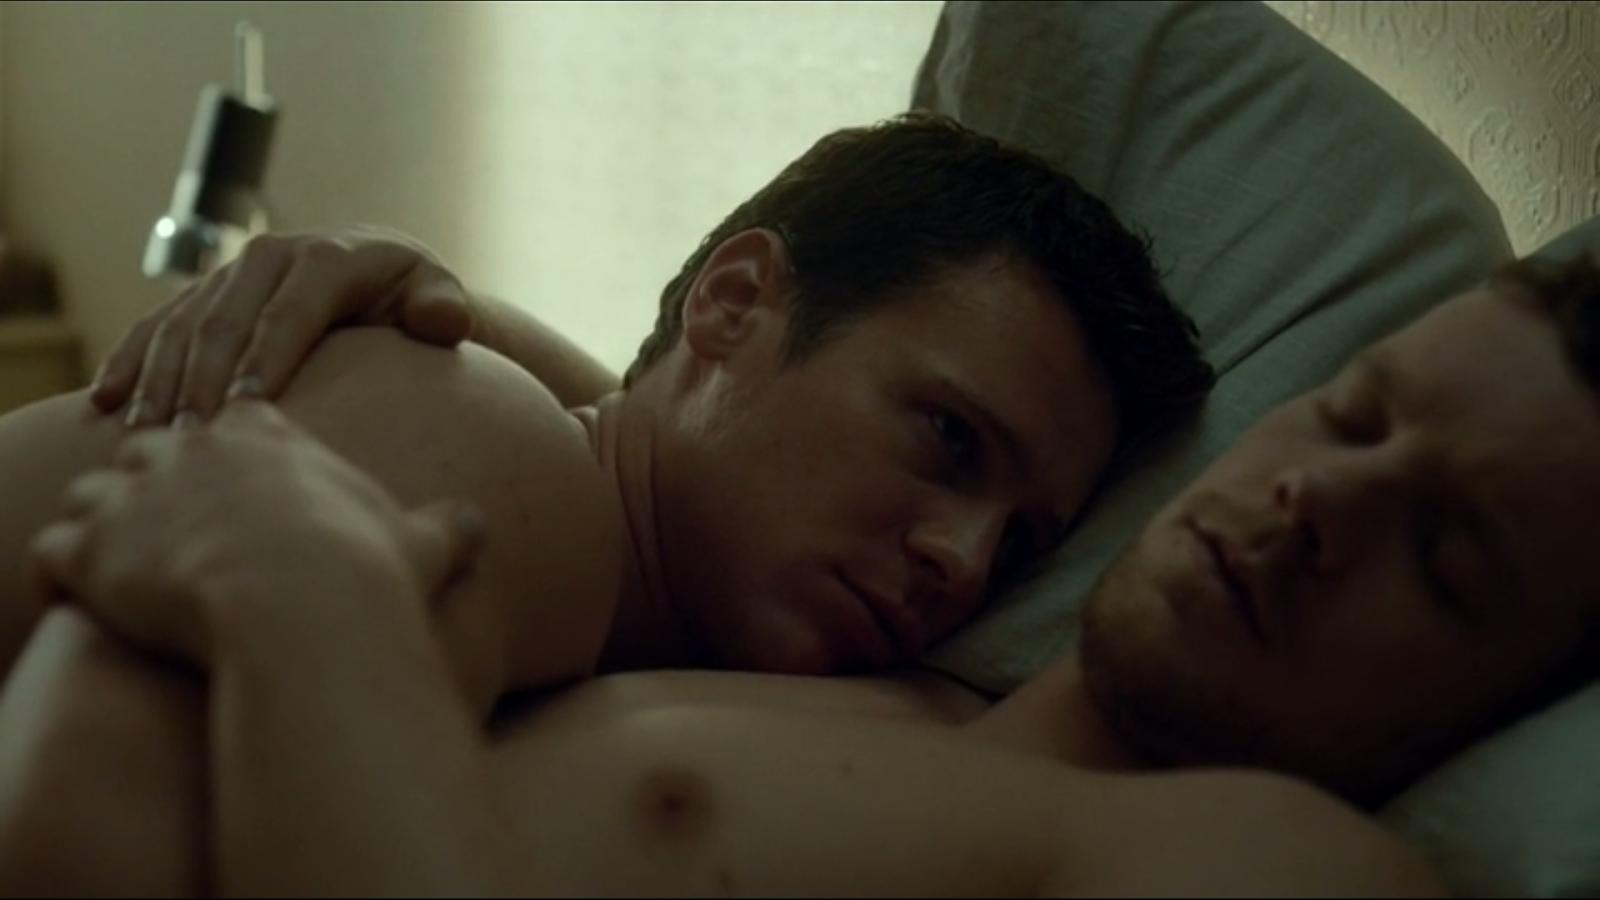 gay massage apache junction az